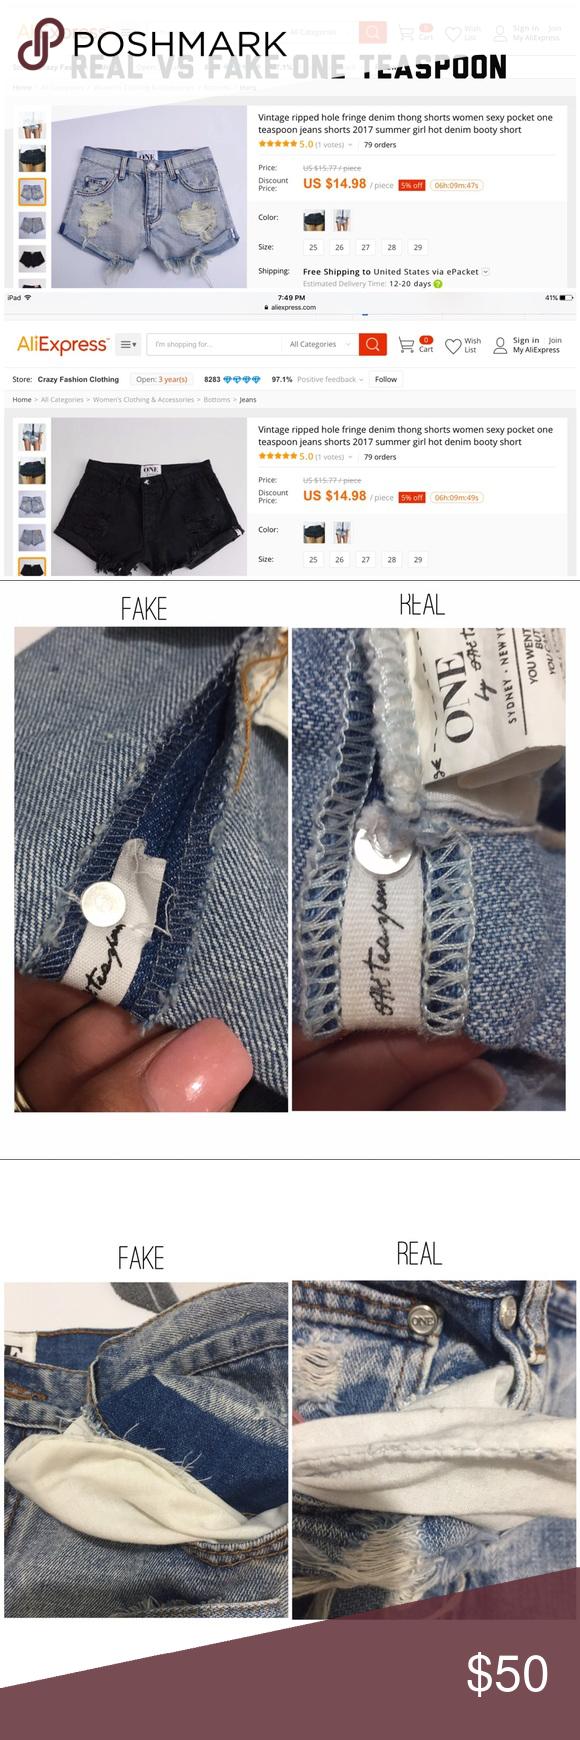 One Teaspoon Shorts Fake Vs Real One Teaspoon Shorts Fashion Trends Fashion